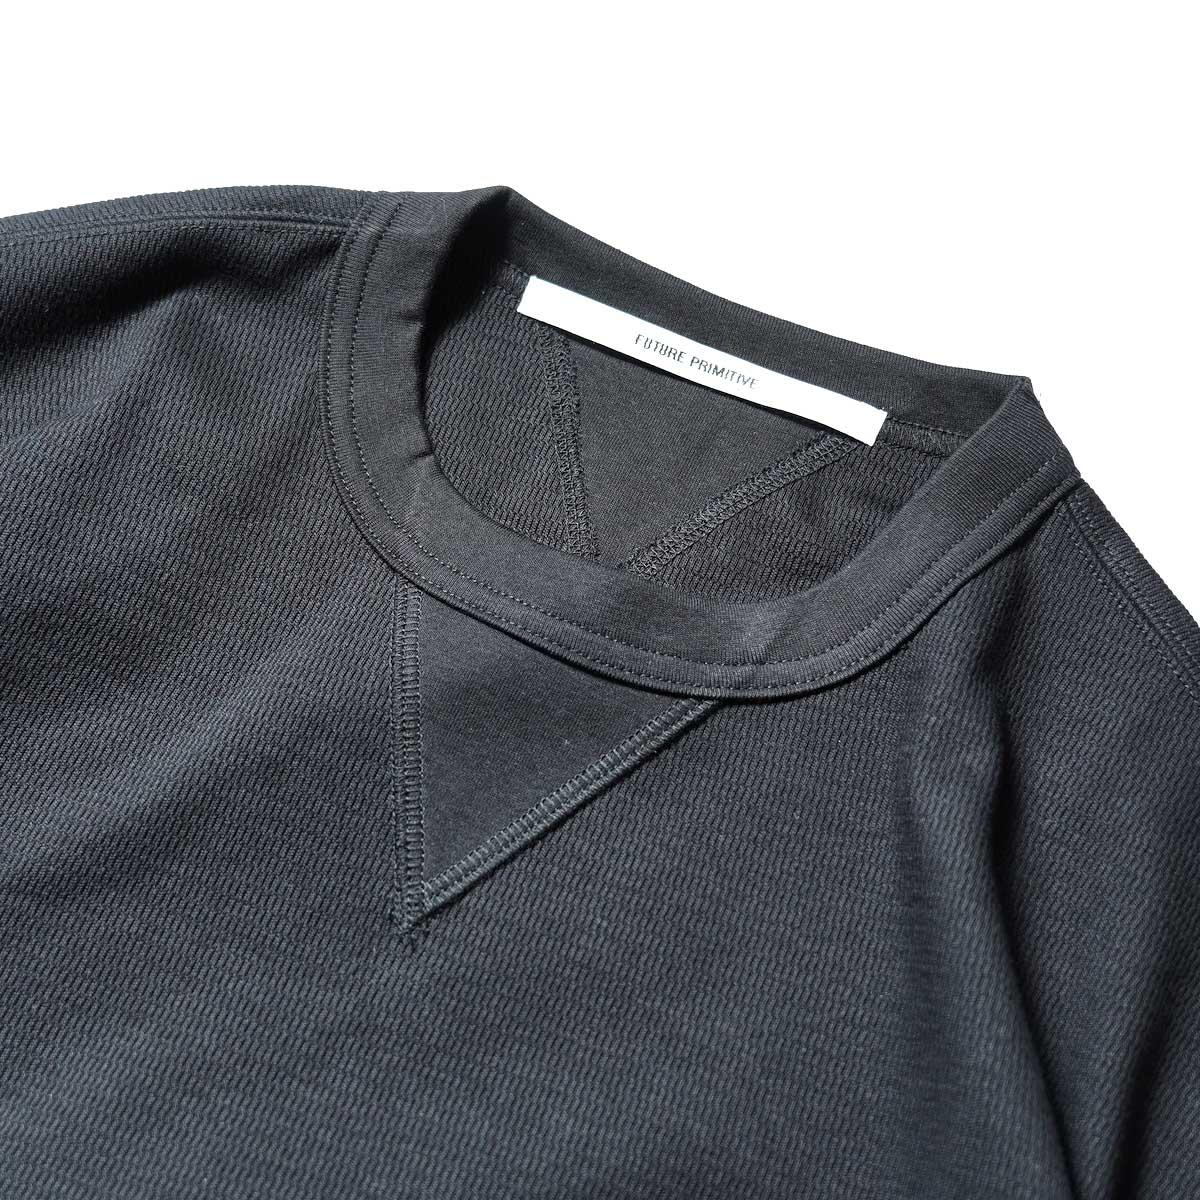 FUTURE PRIMITIVE / FP THERMAL V T-SHIRT (Black)ガセット